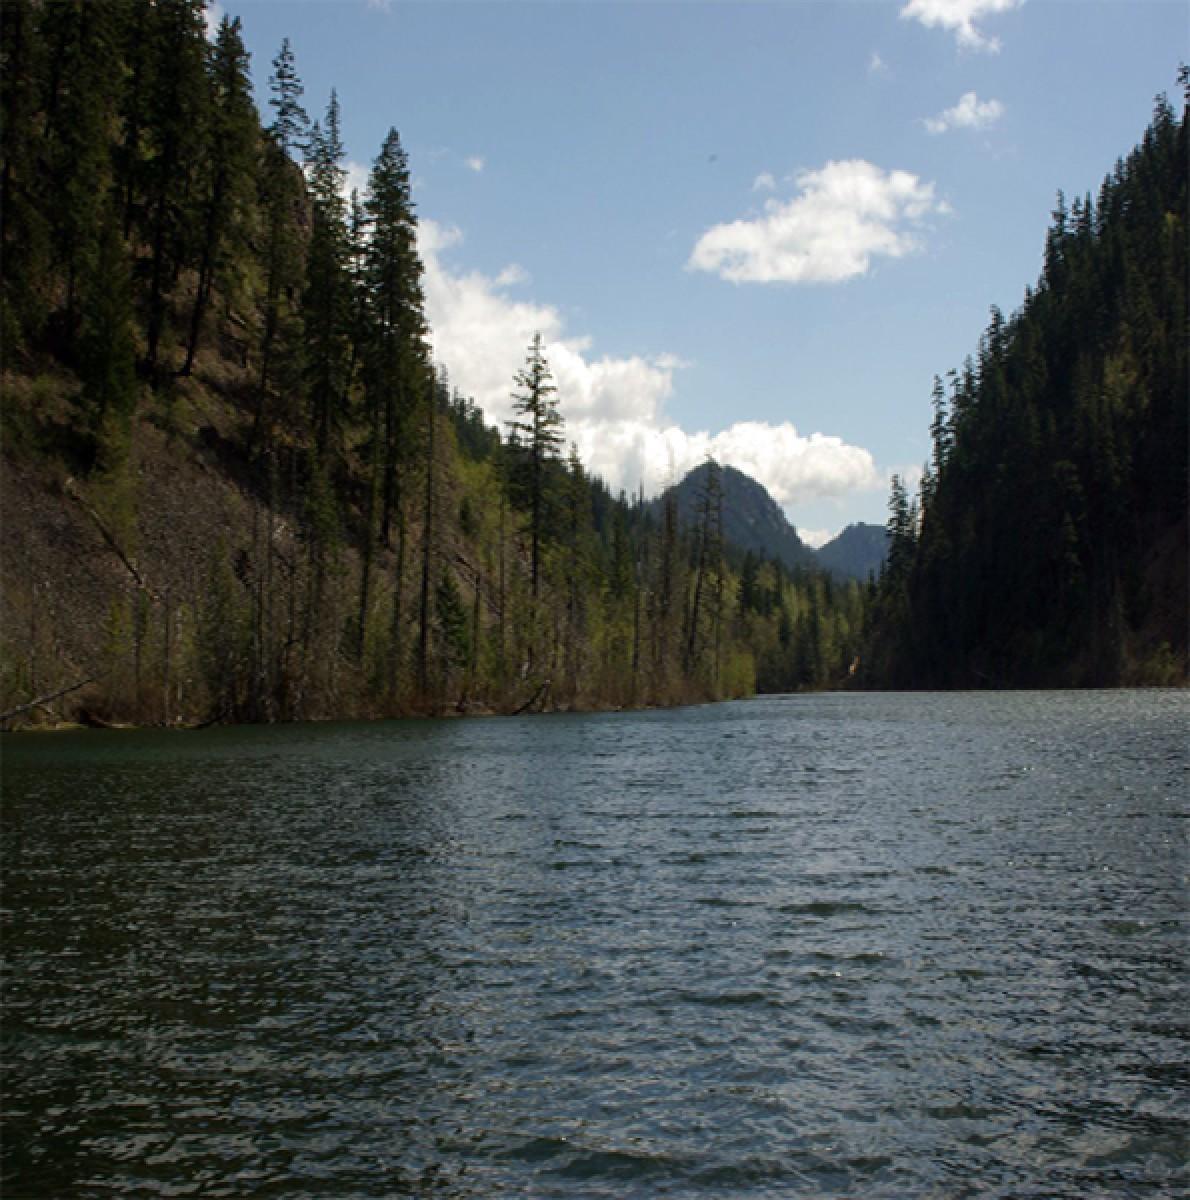 Blue Lake Resort - Campground Reviews, Deals - Boston Bar